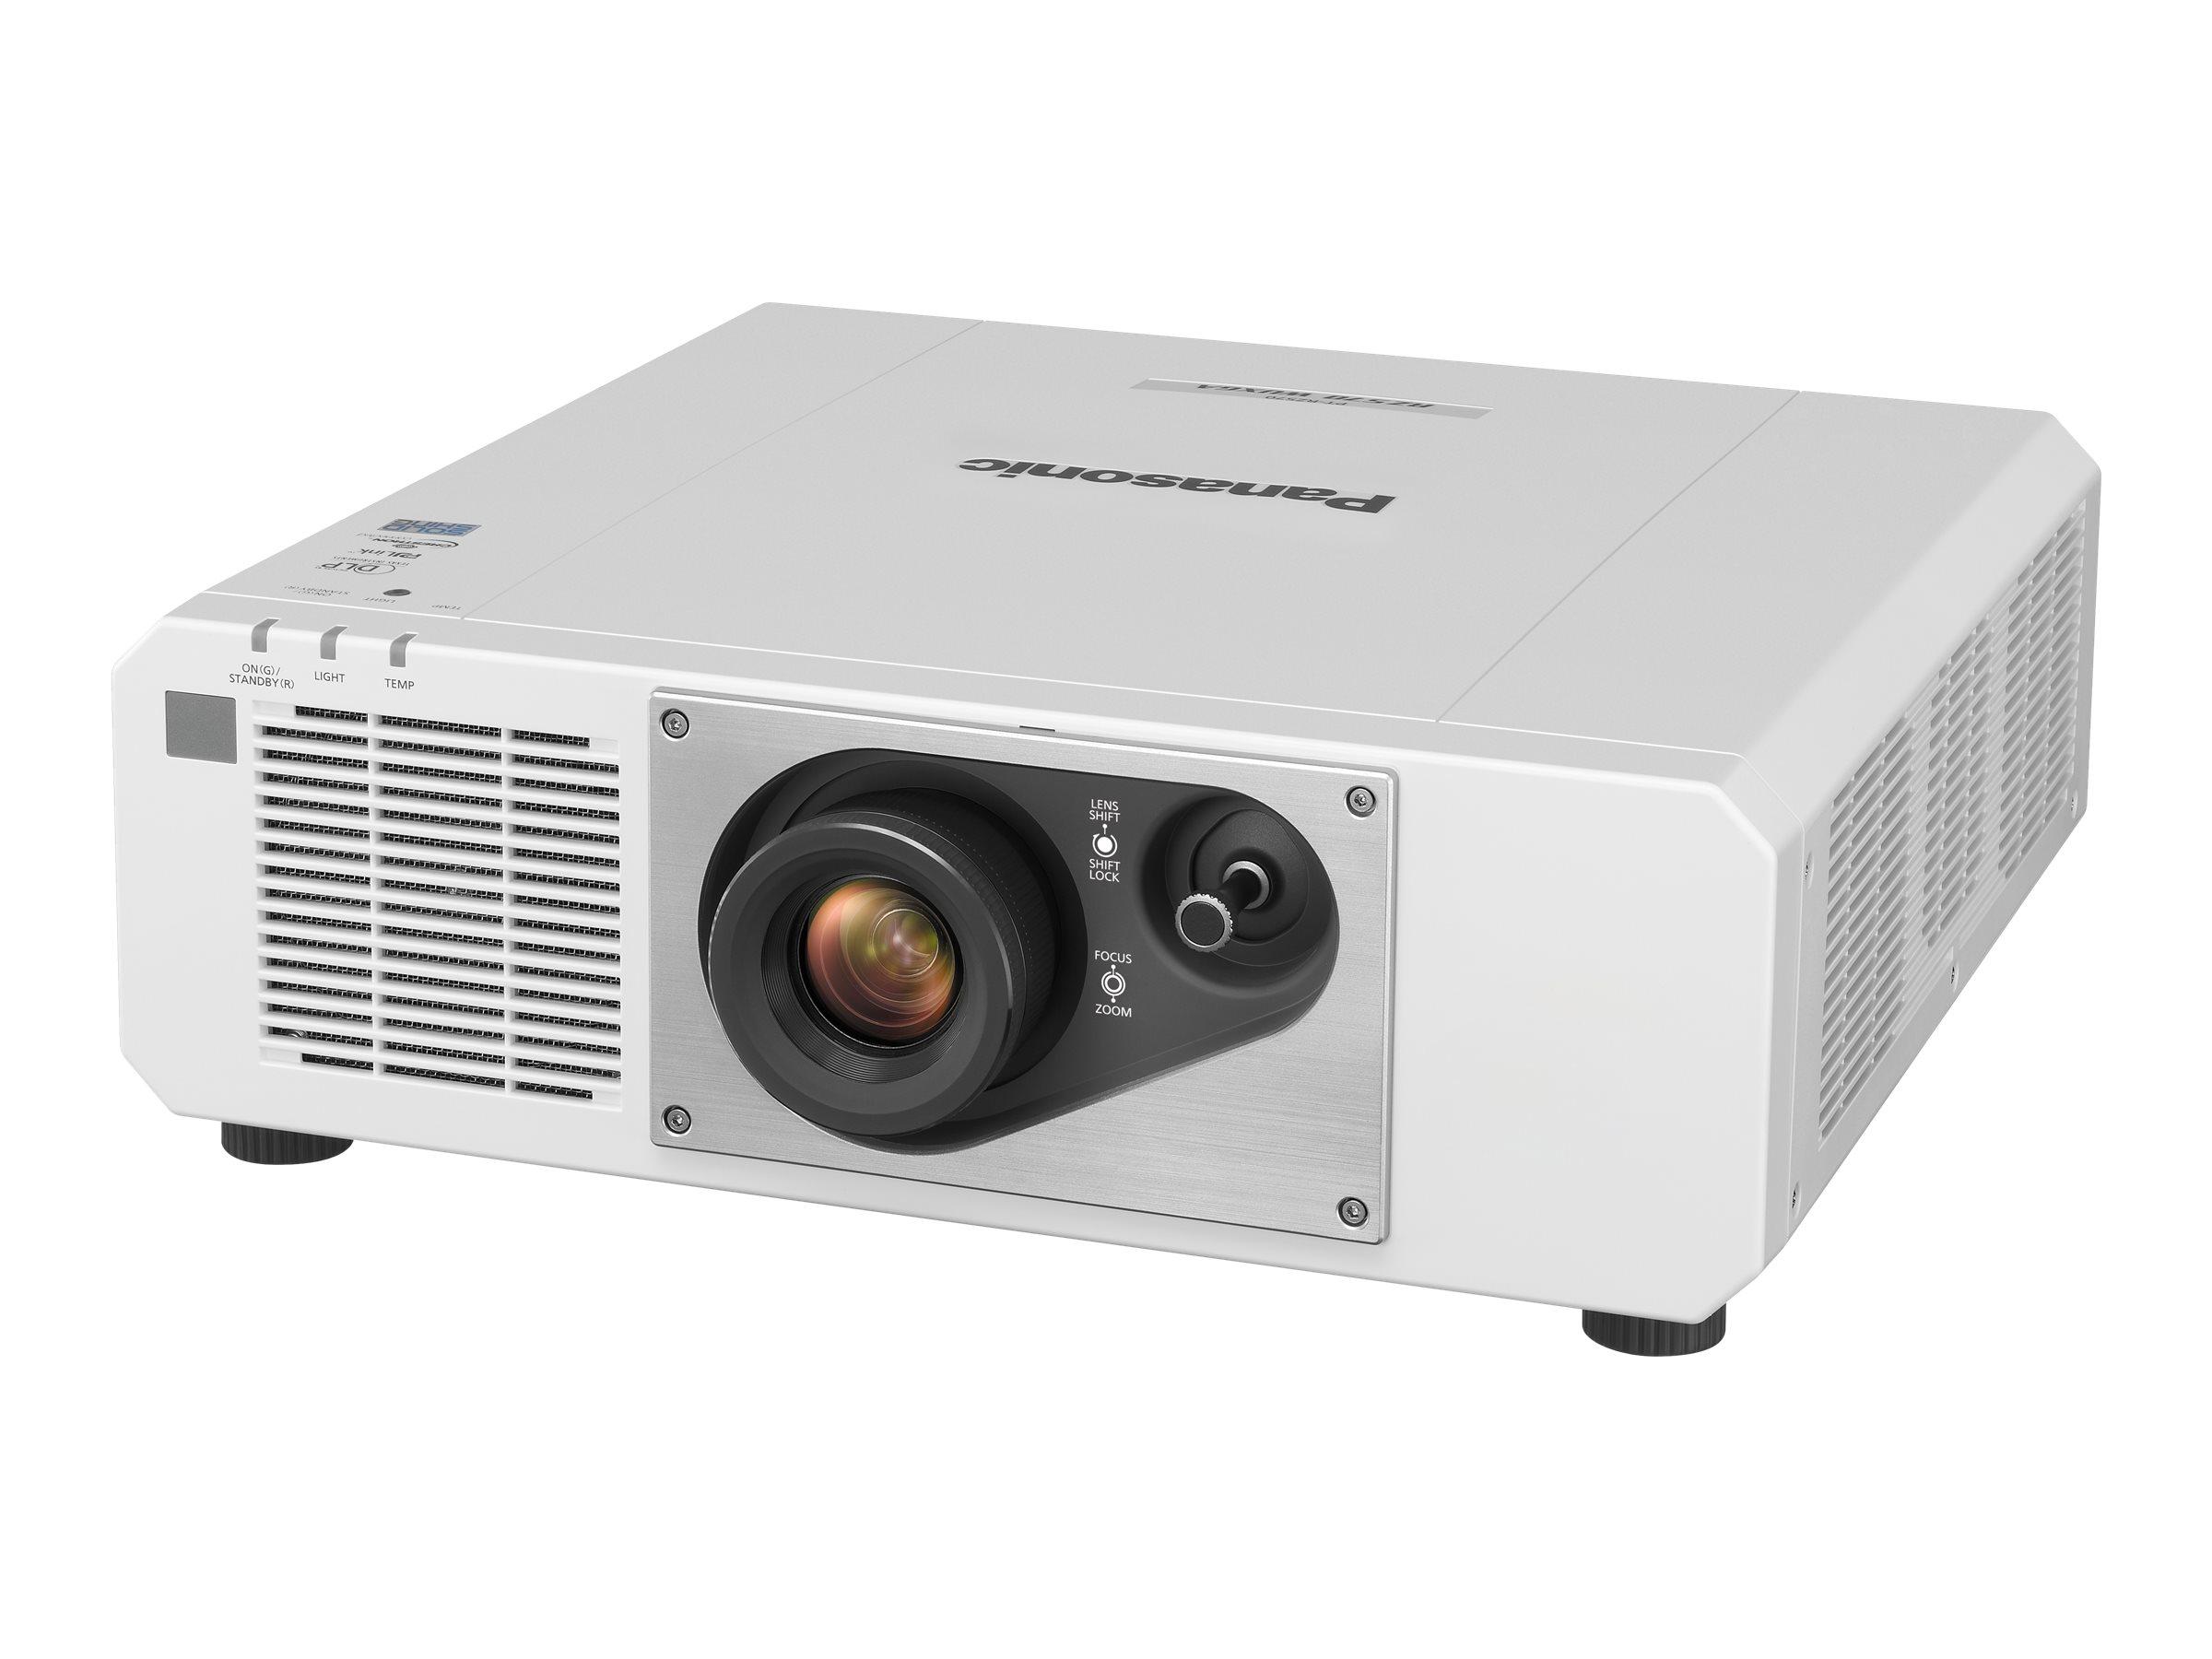 Panasonic PT-RZ570WEJ - DLP-Projektor - 5400 lm - WUXGA (1920 x 1200) - 16:10 - 1080p